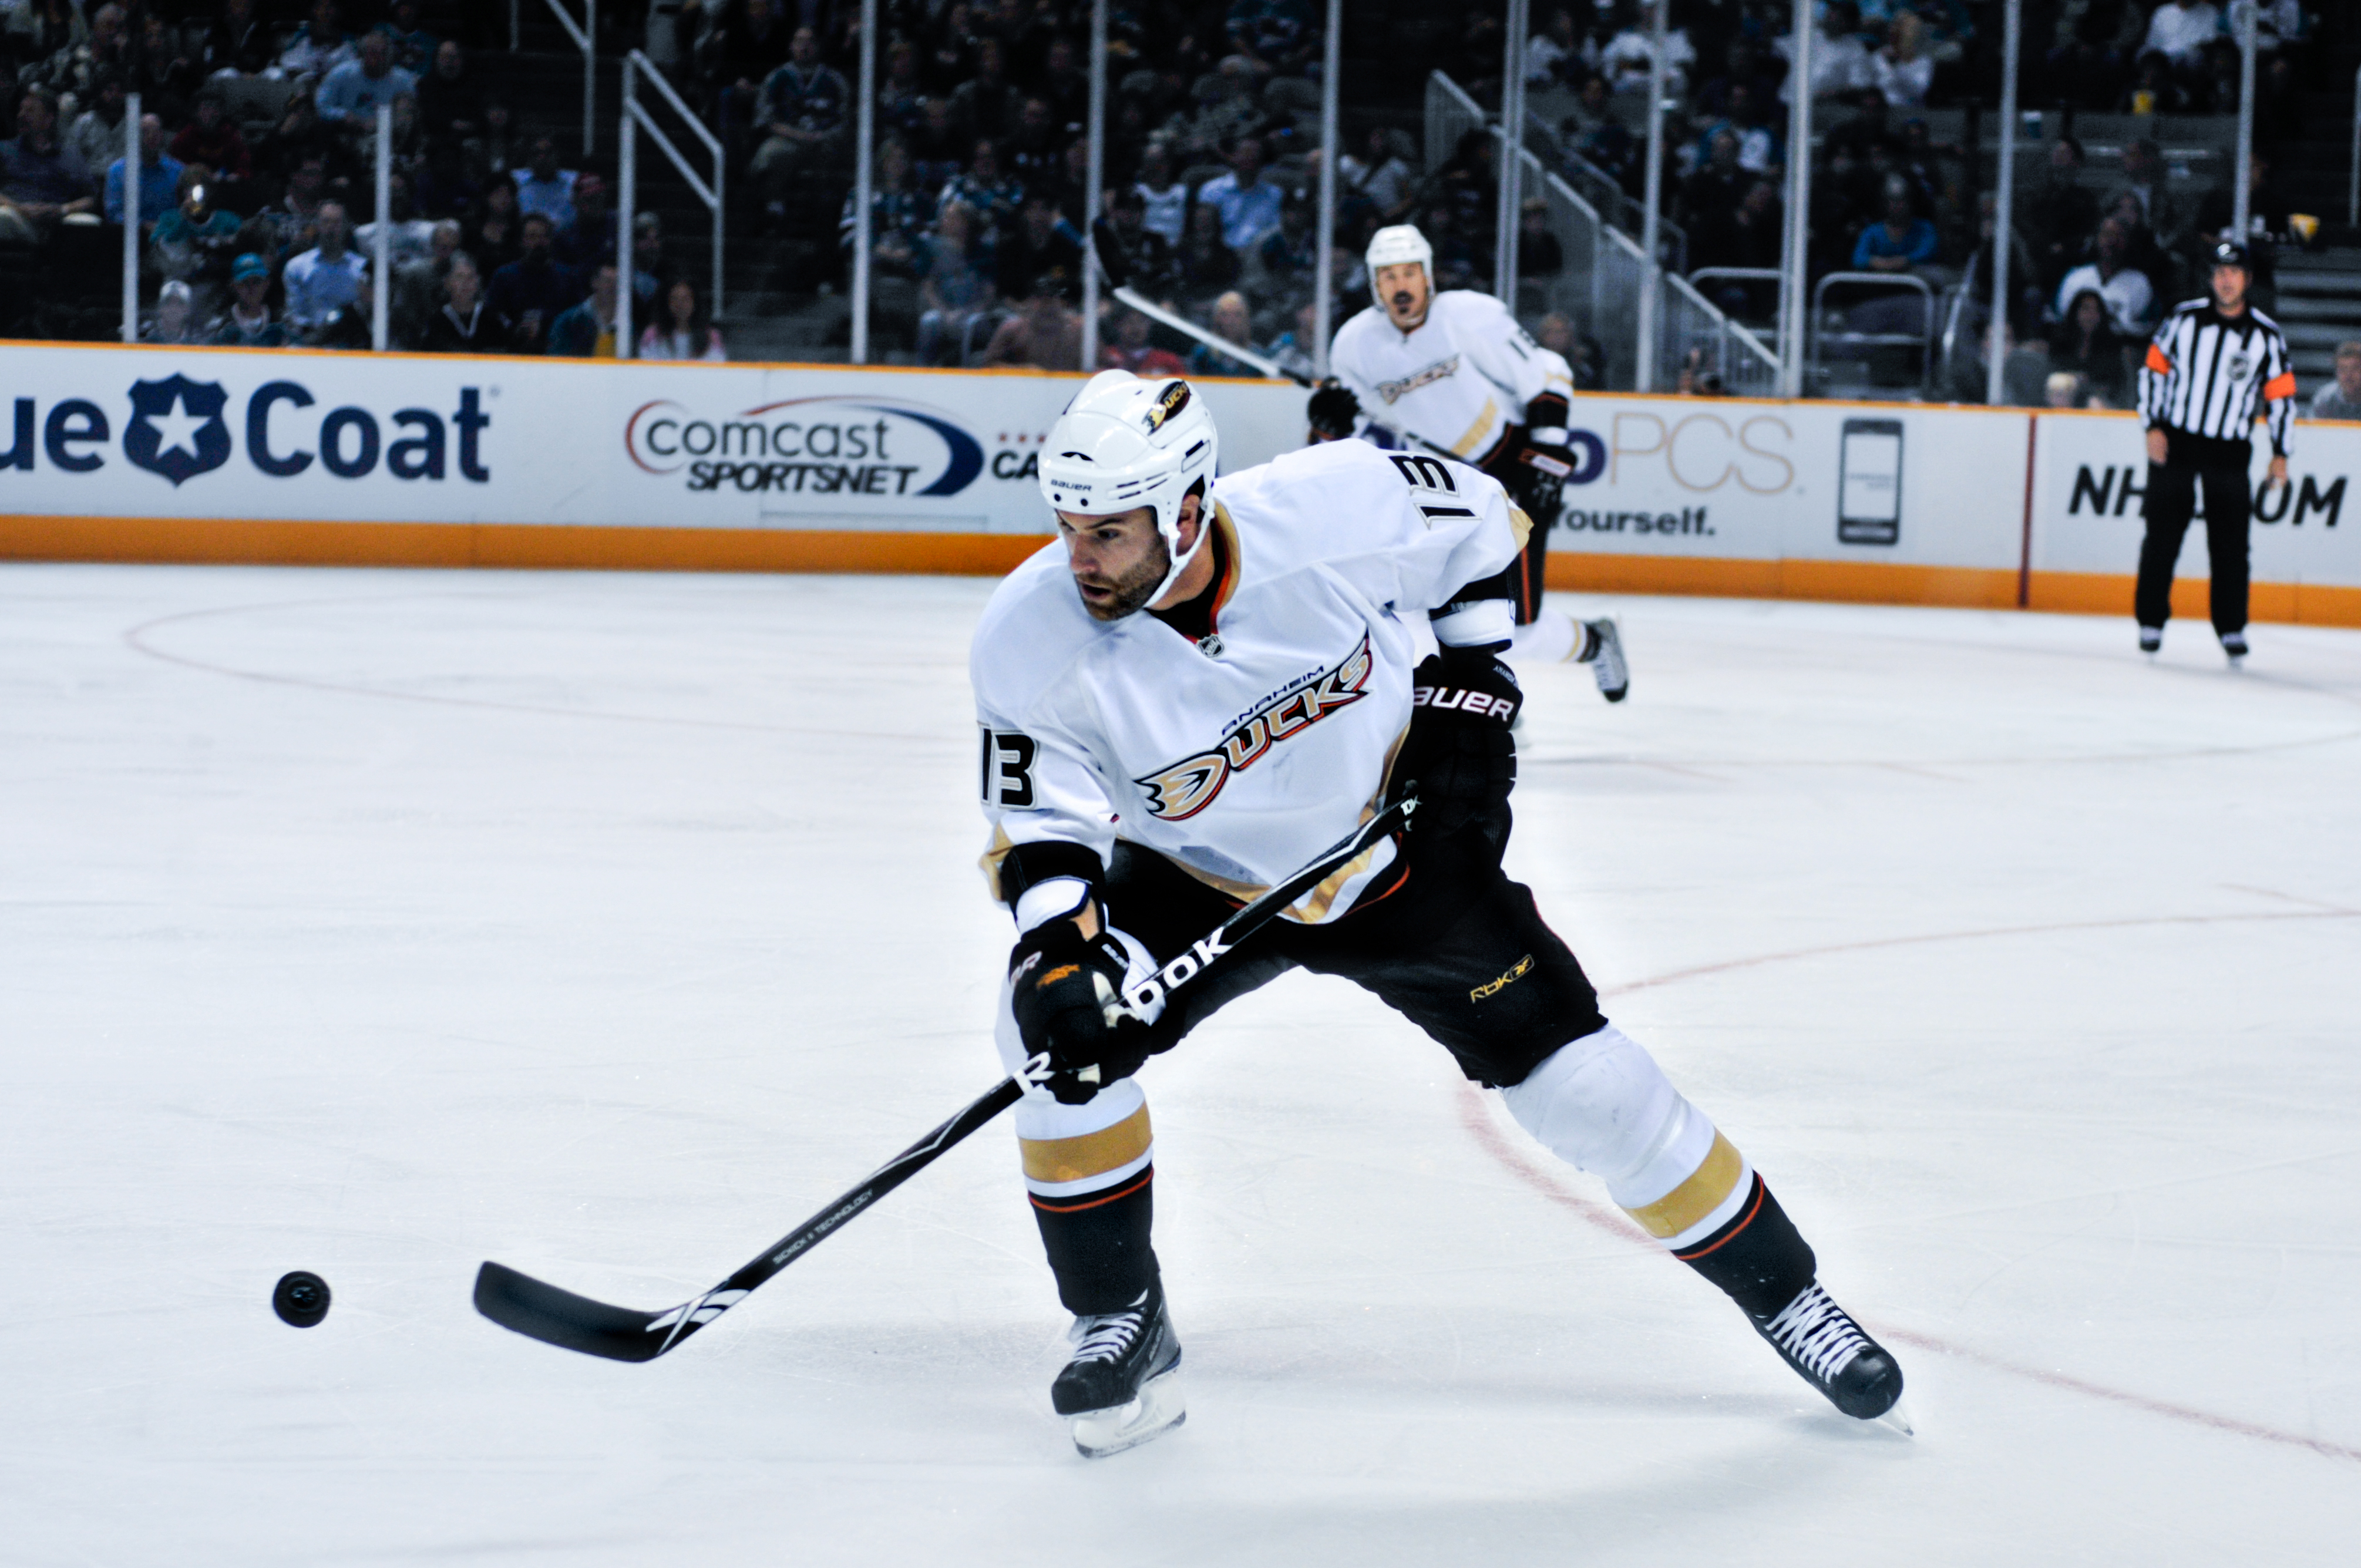 Images of Ice Hockey | 4020x2670